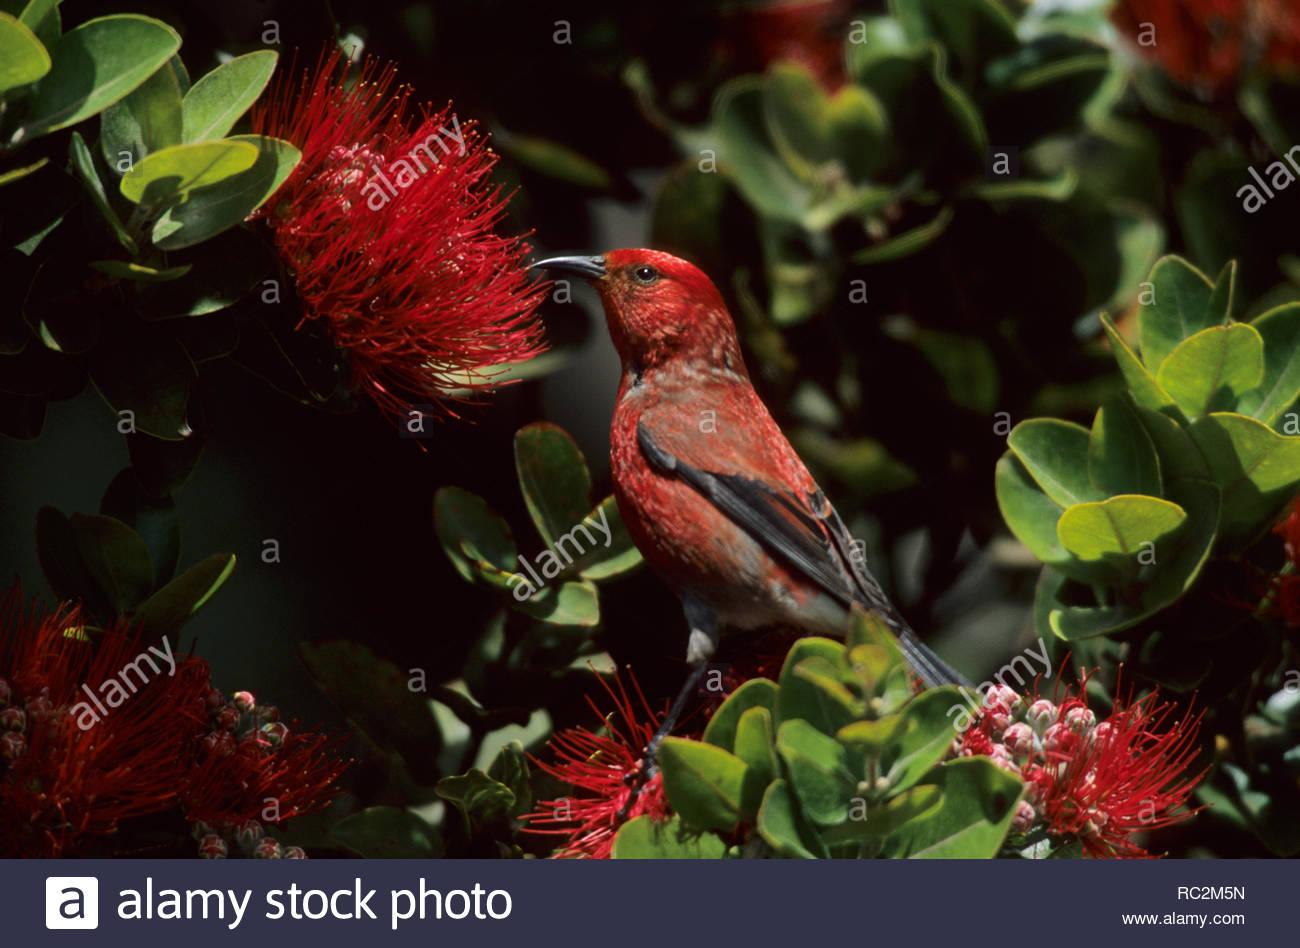 Apapane - on Ohio Flower Himatione sanguinea Big Island, Hawaii BI005647 Stock Photo